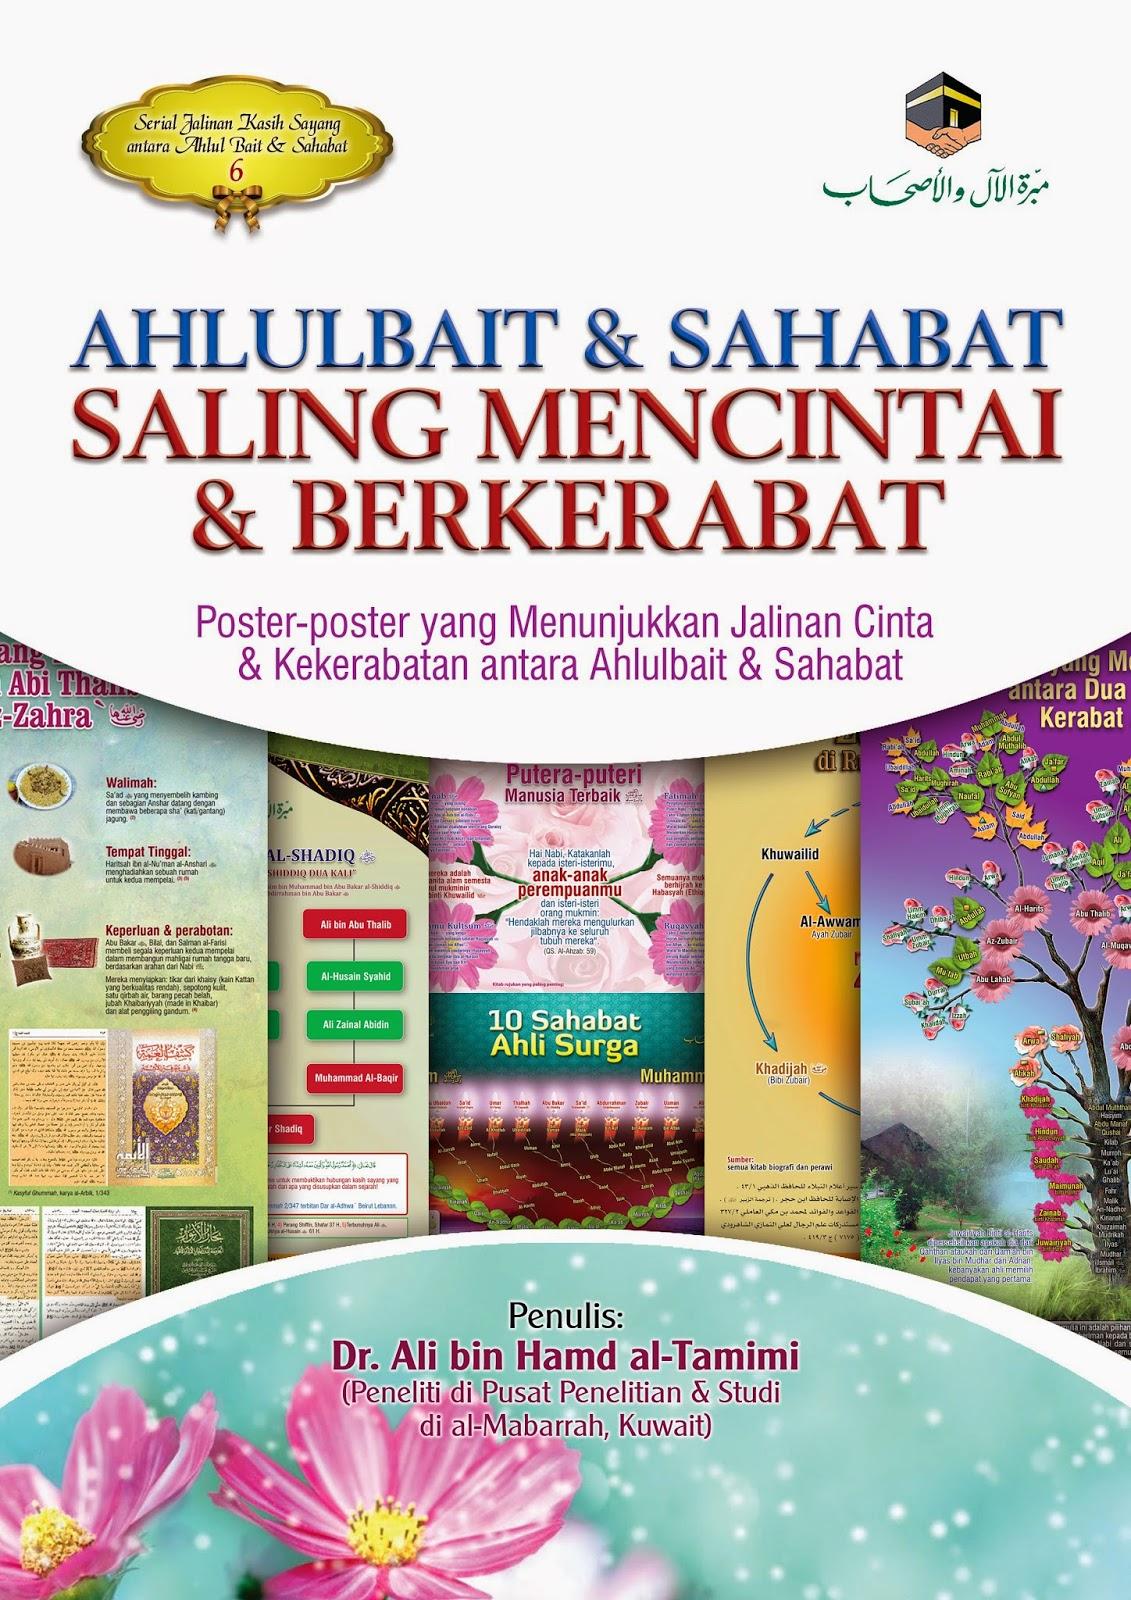 Ahlul Bait & Shahabat Saling Mencintai